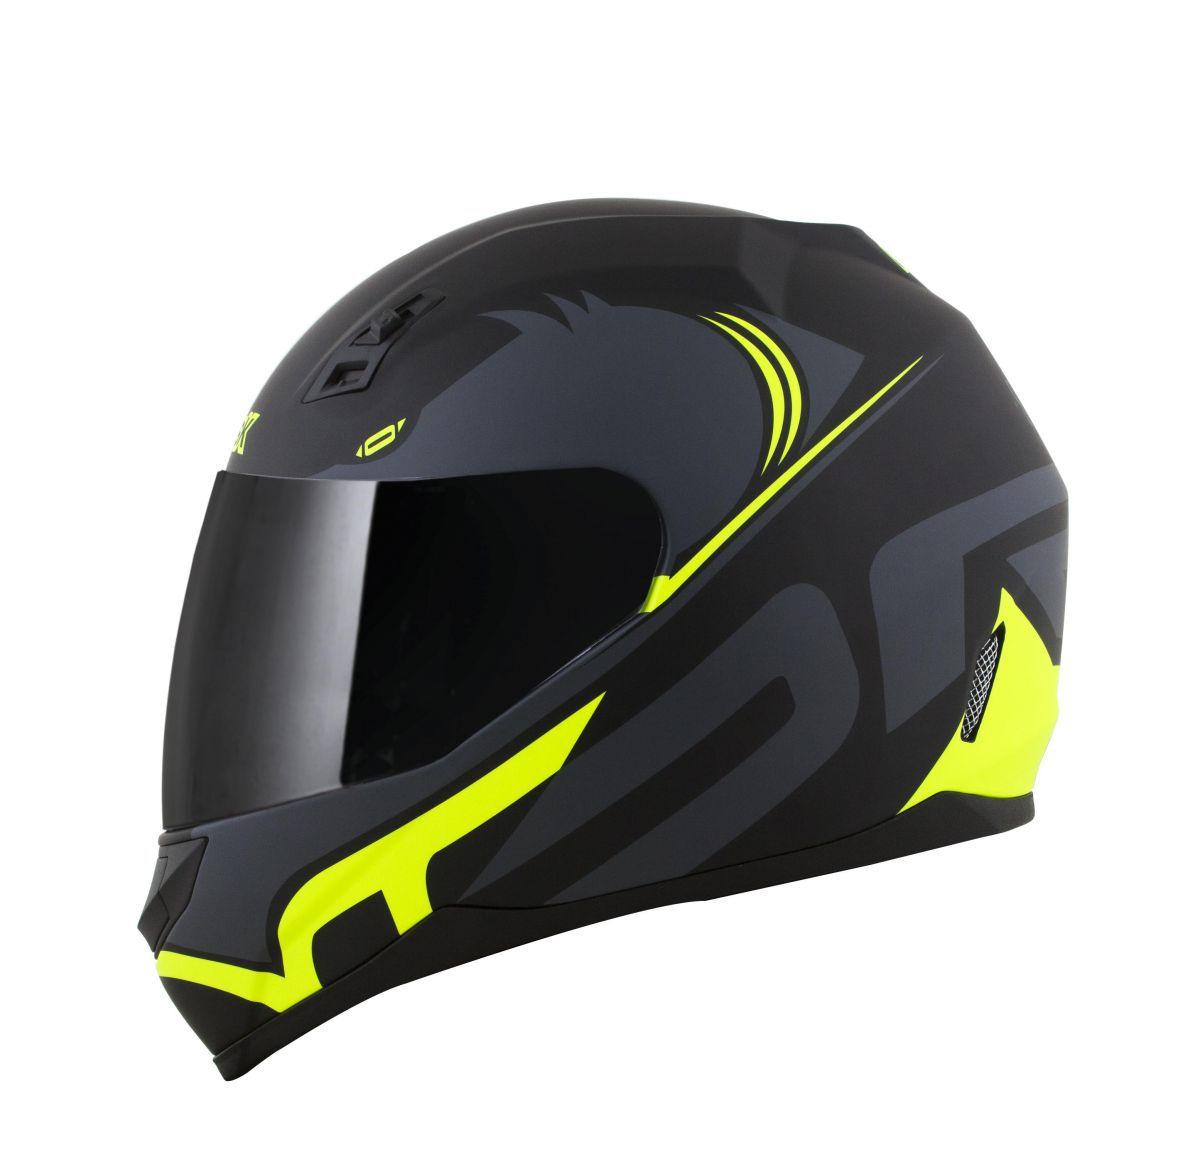 Capacete Norisk Ff391 Stunt Squalo Black/ Yellow